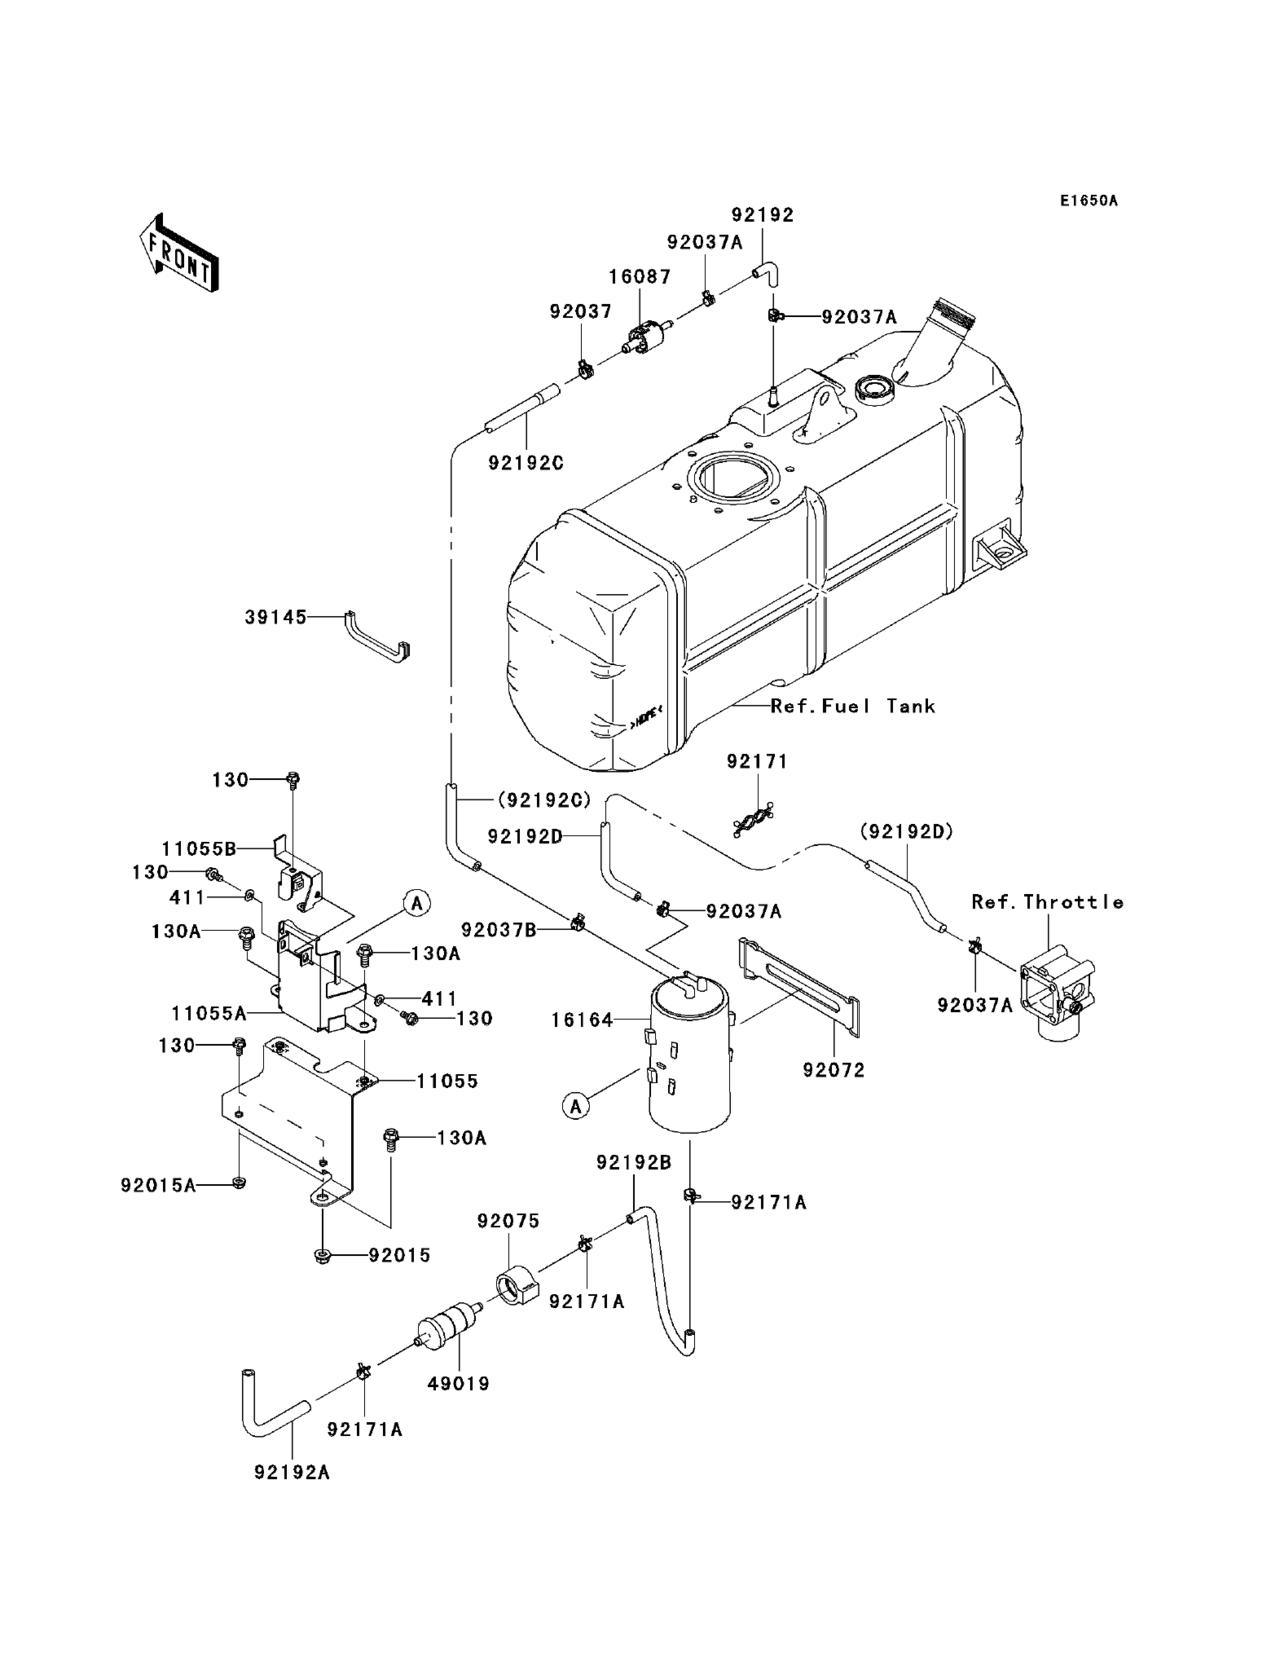 Diagram 610 Mule Wiring Diagram Full Version Hd Quality Wiring Diagram Nudiagrams21 Japanfest It